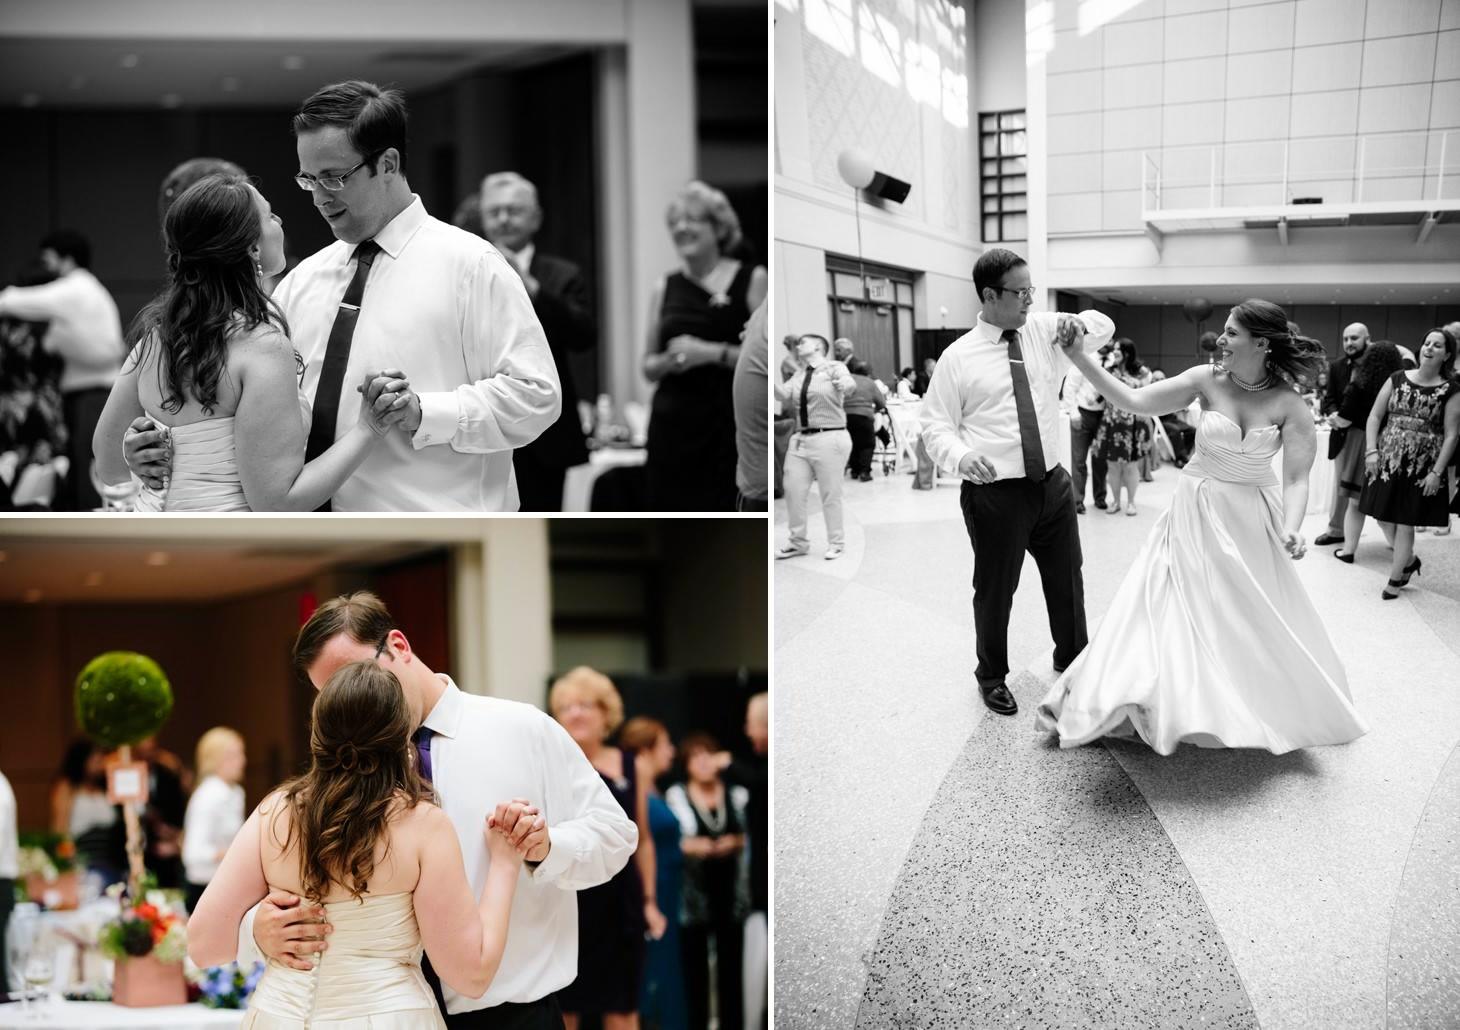 102-nyc-wedding-photographer-hoboken-waterfront-wedding-photos-smitten-chickens.jpg